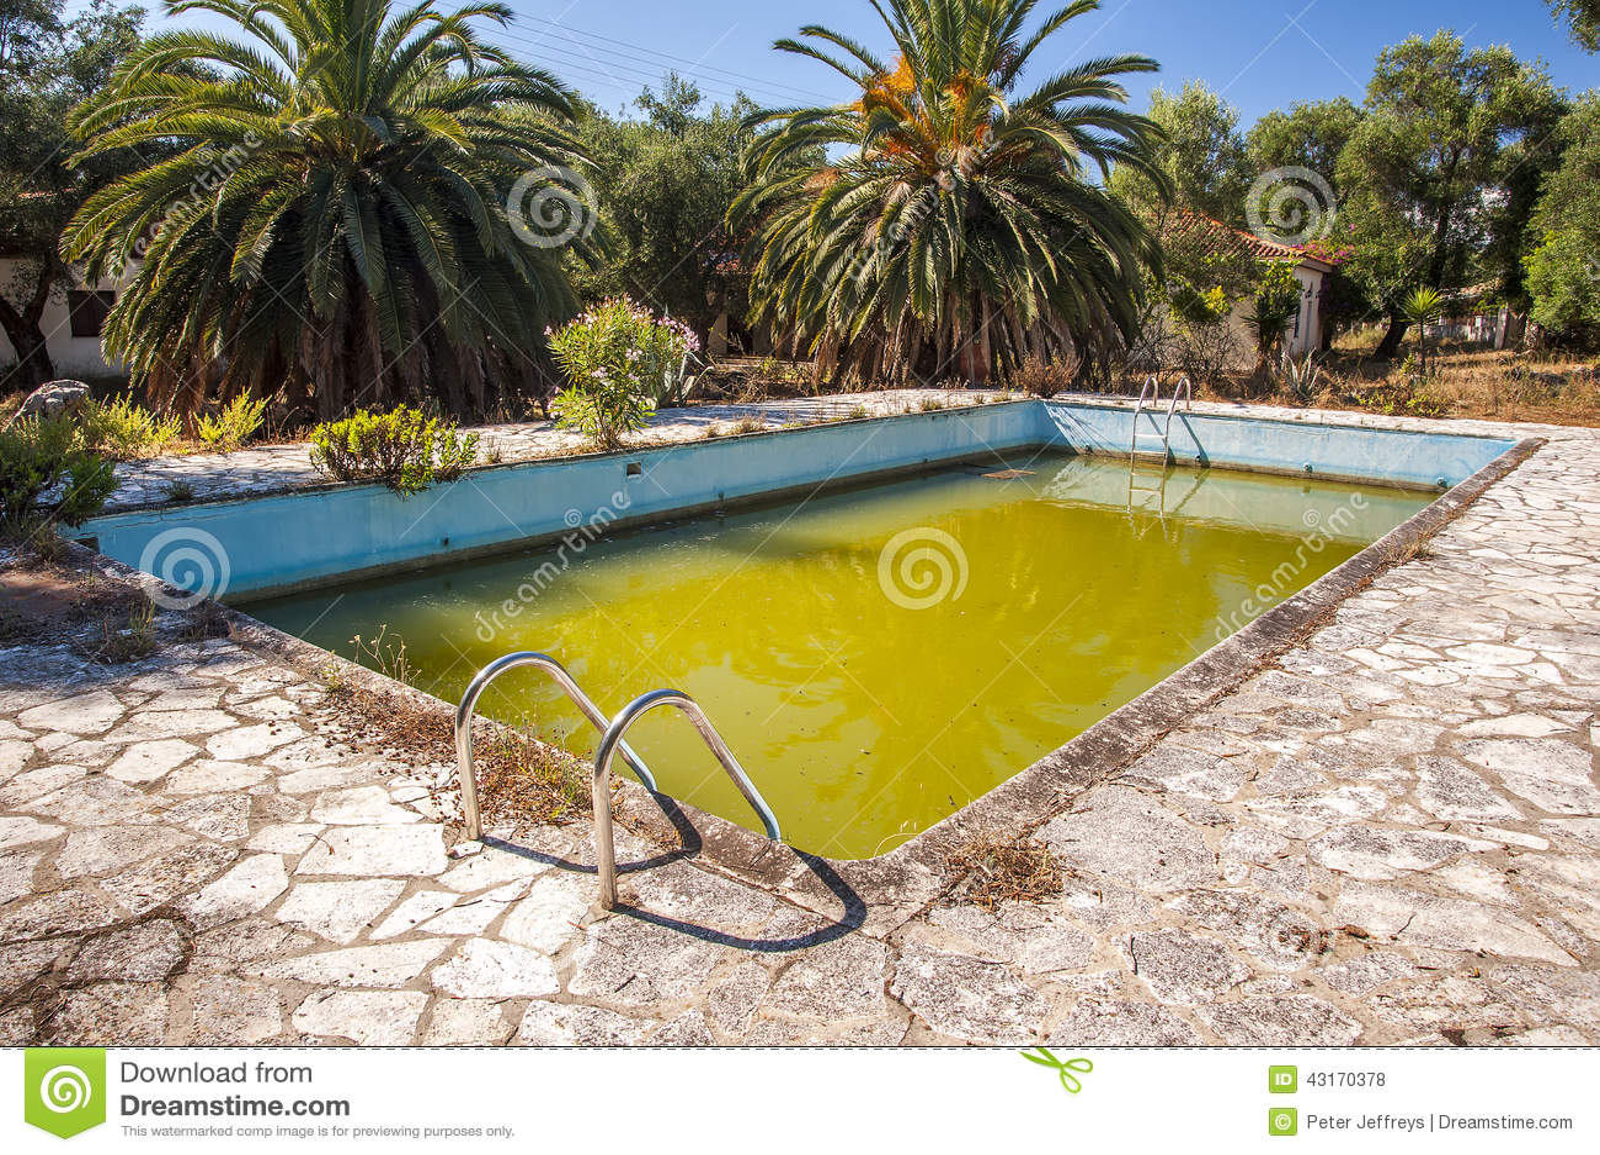 Fauliges grünes Wasser in verlassenem Swimmingpool